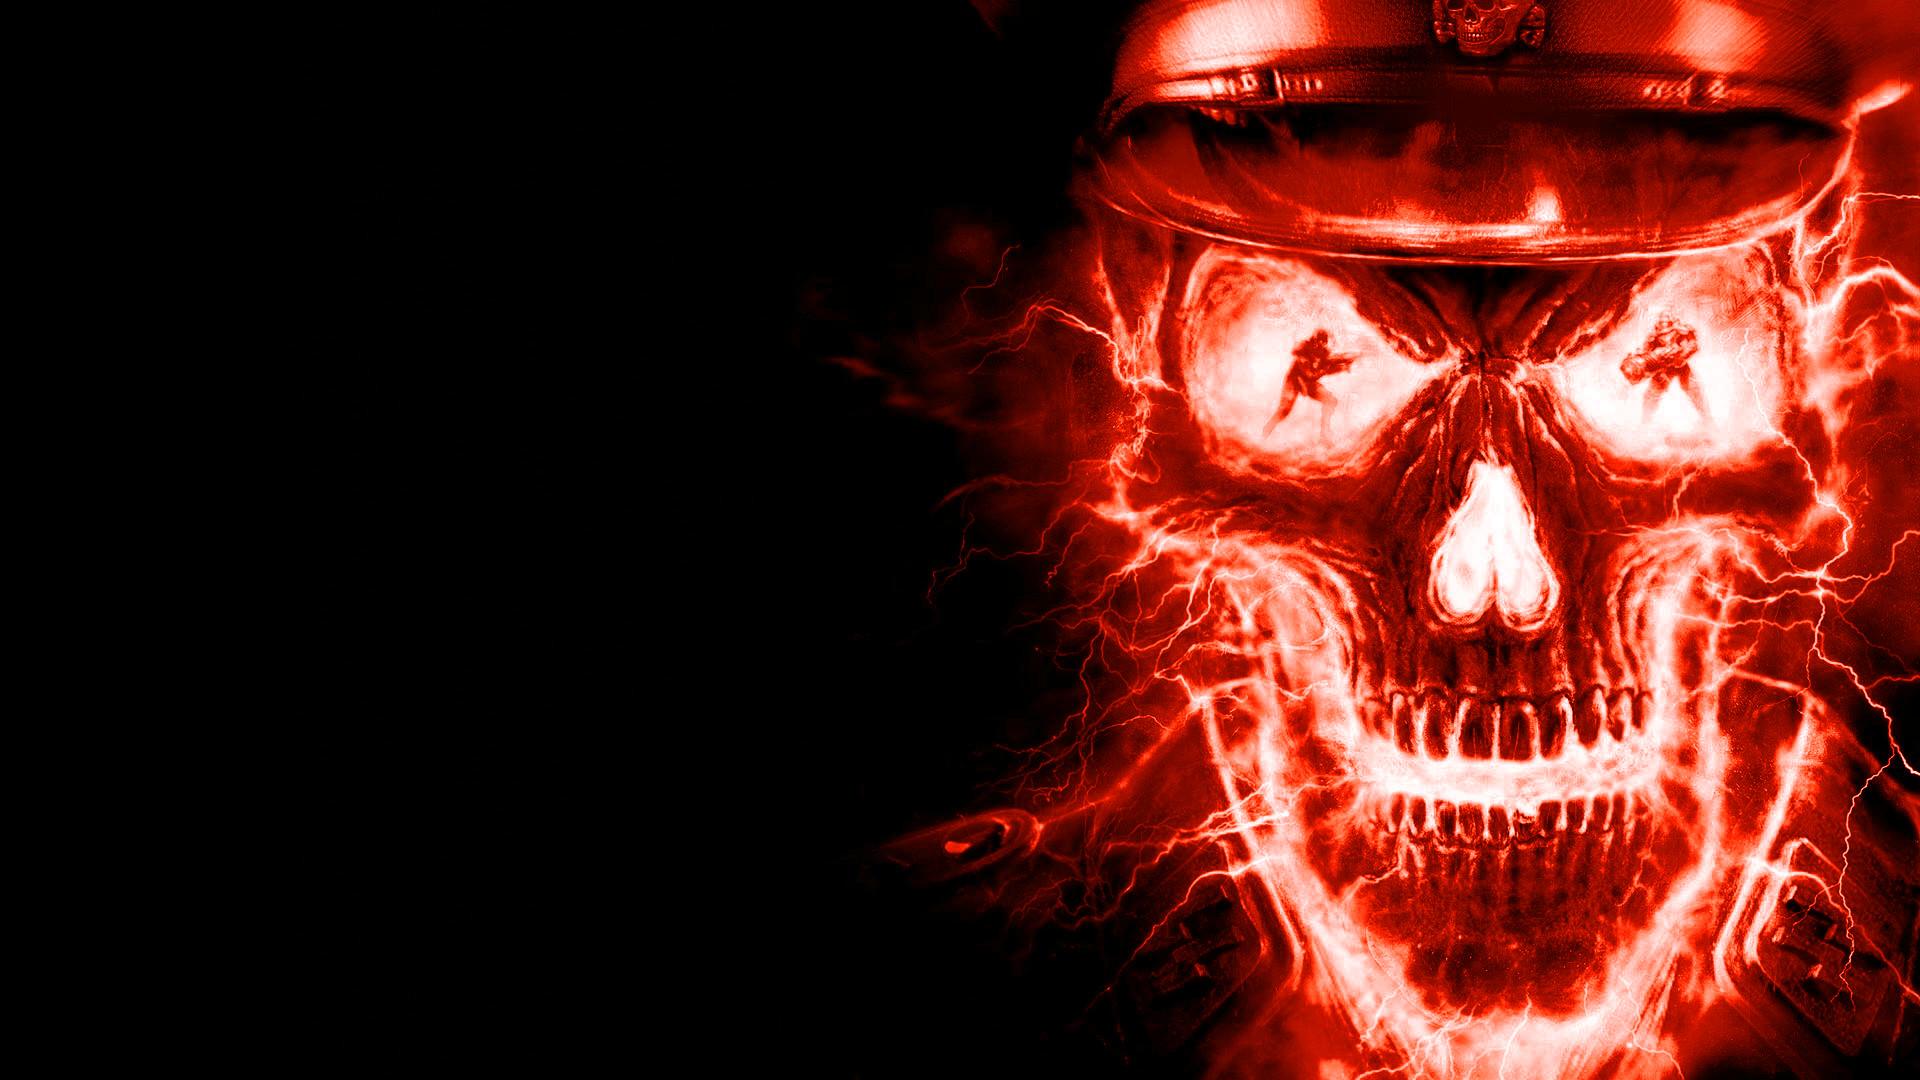 Red Skulls On Fire Photo, fire skull texture